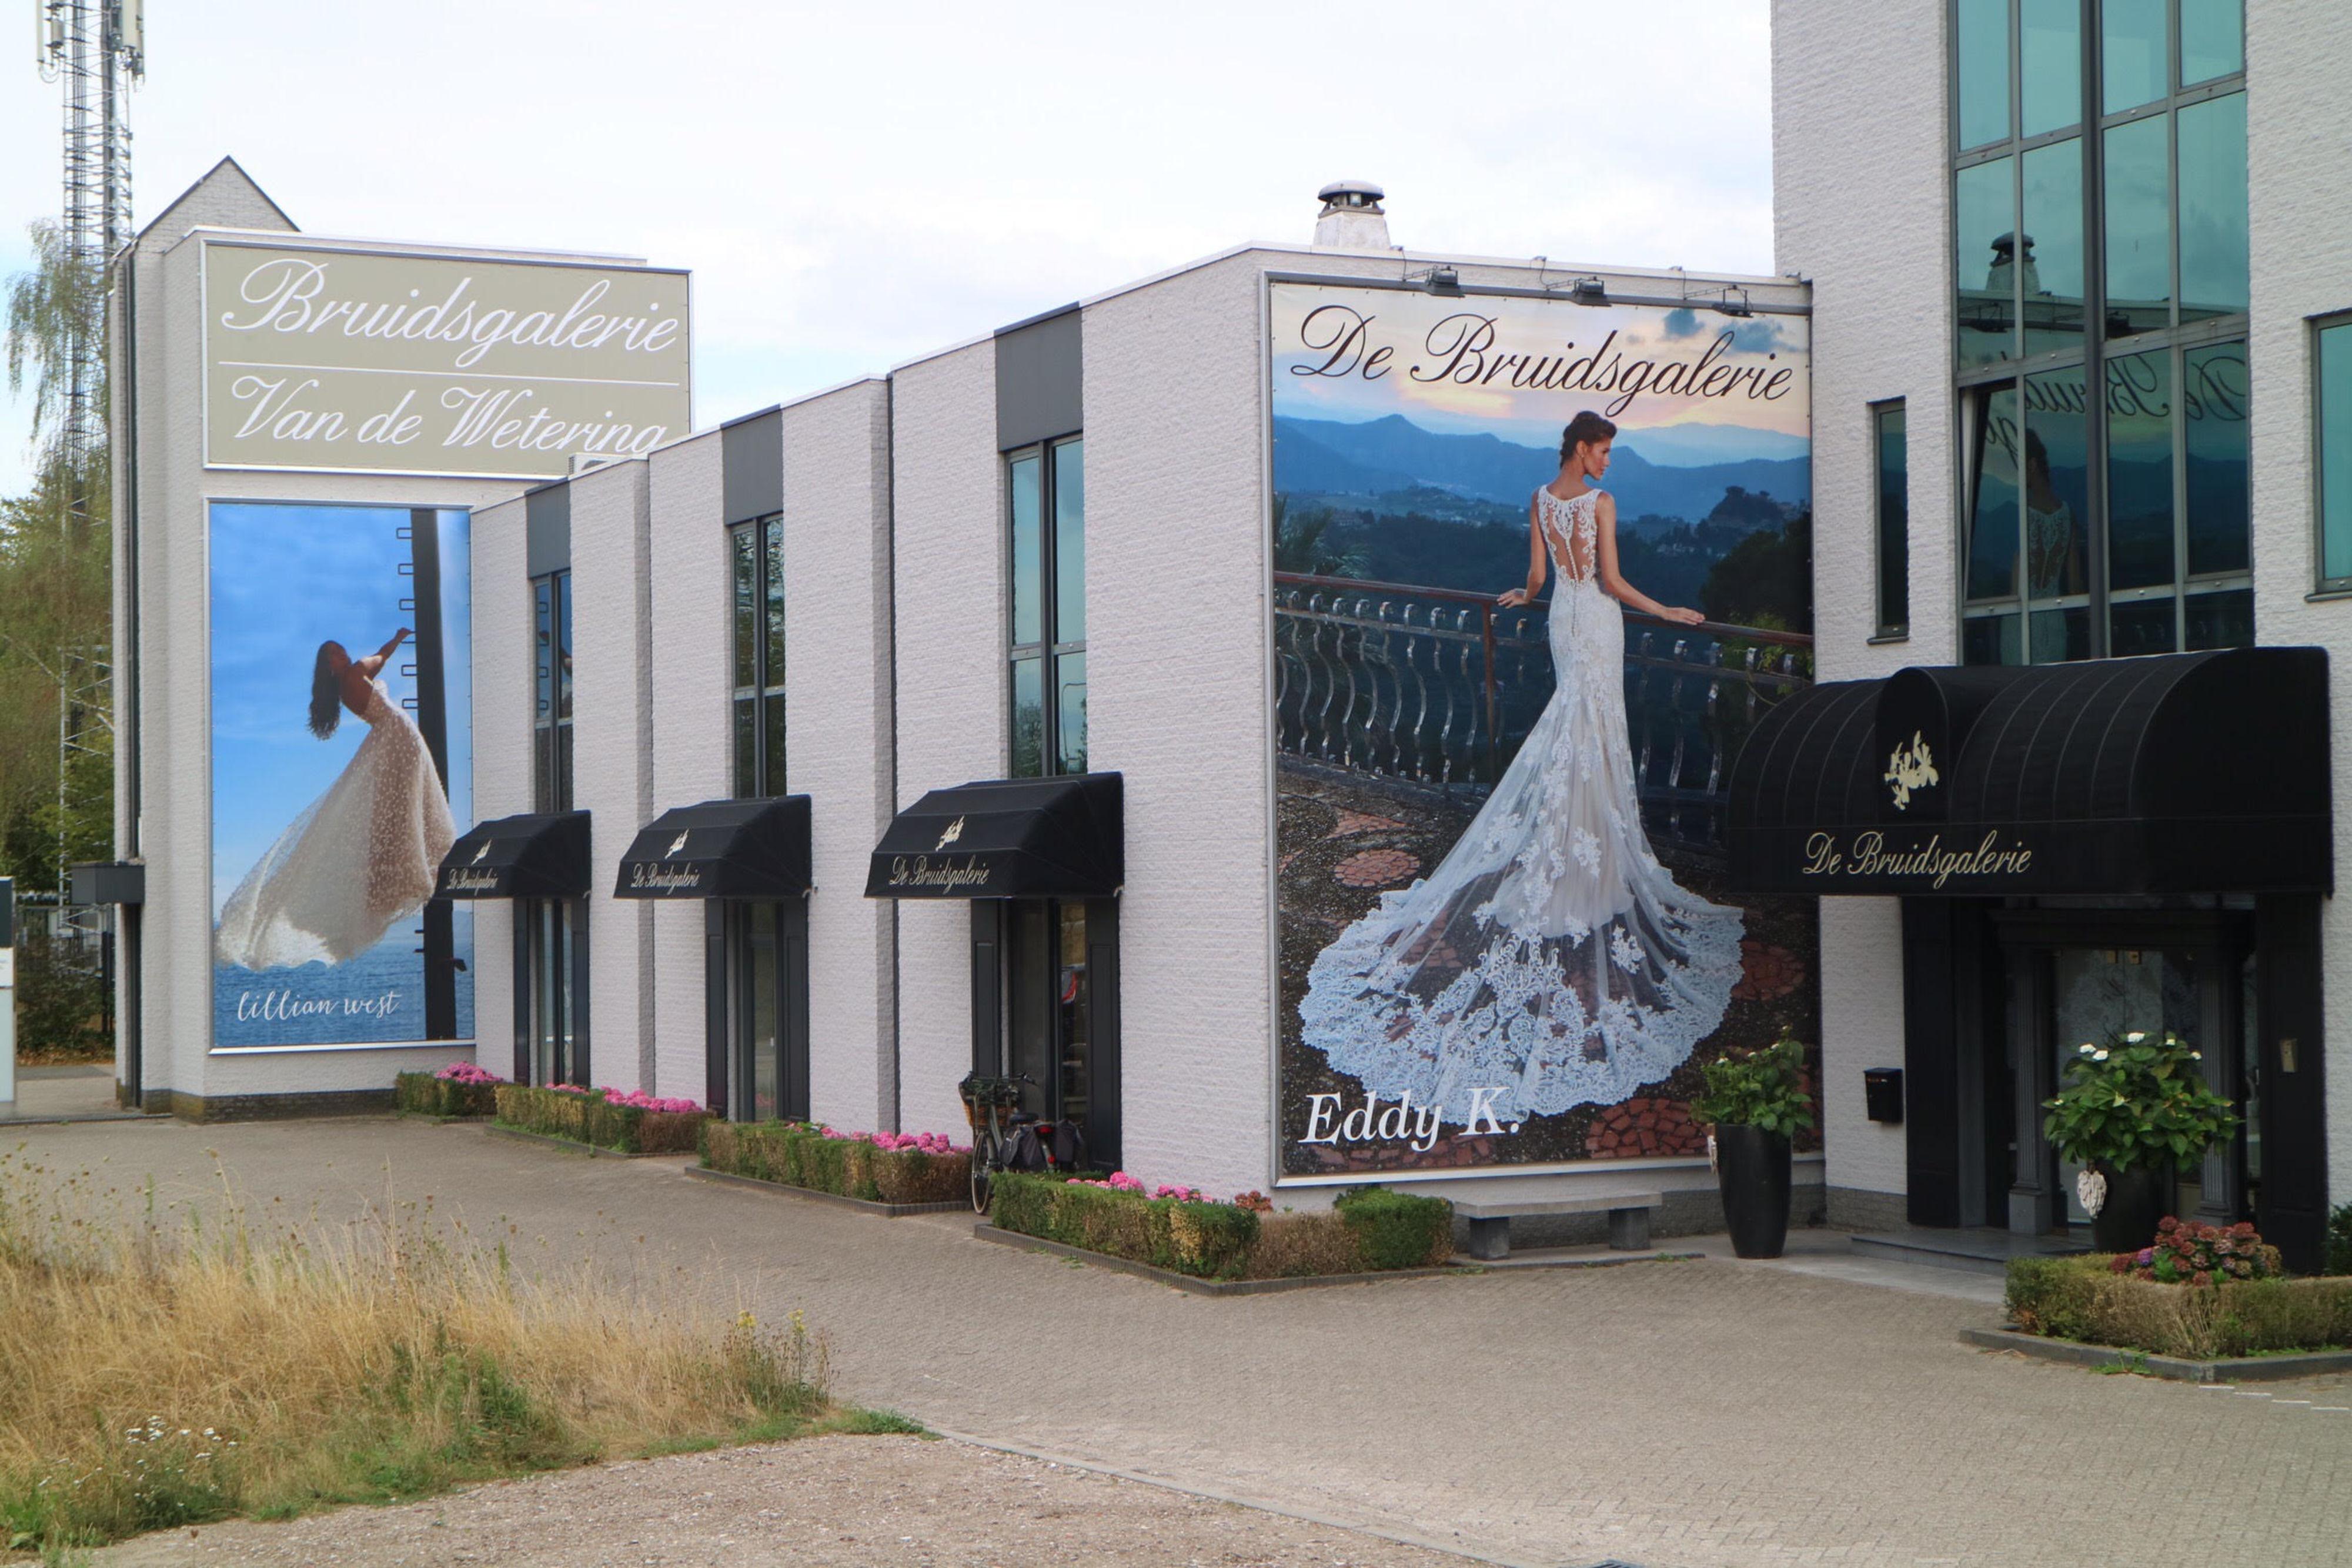 De Bruidsgalerie trouwjurken